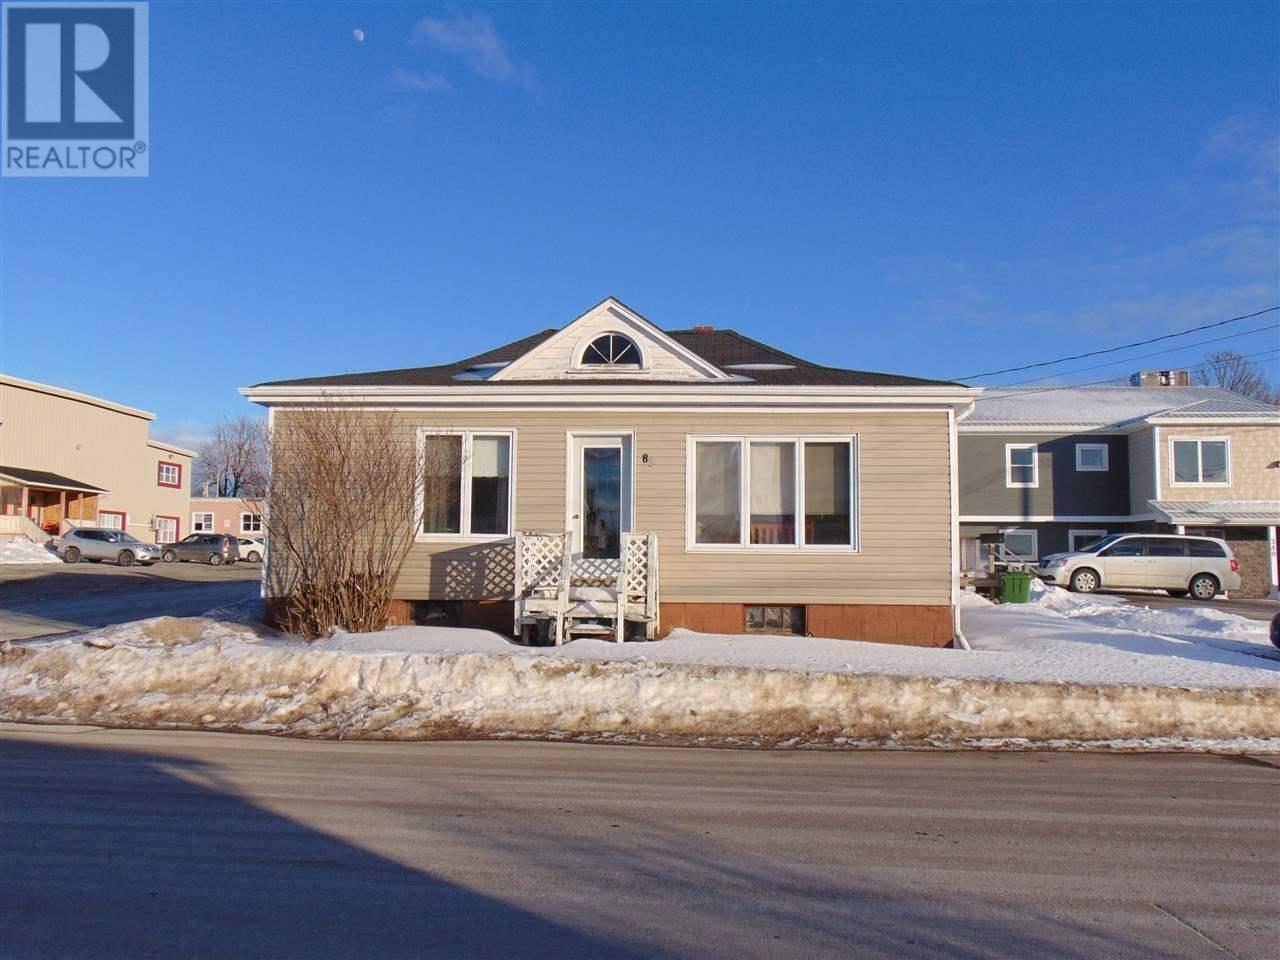 House for sale at 89 Cedar St Summerside Prince Edward Island - MLS: 202002467